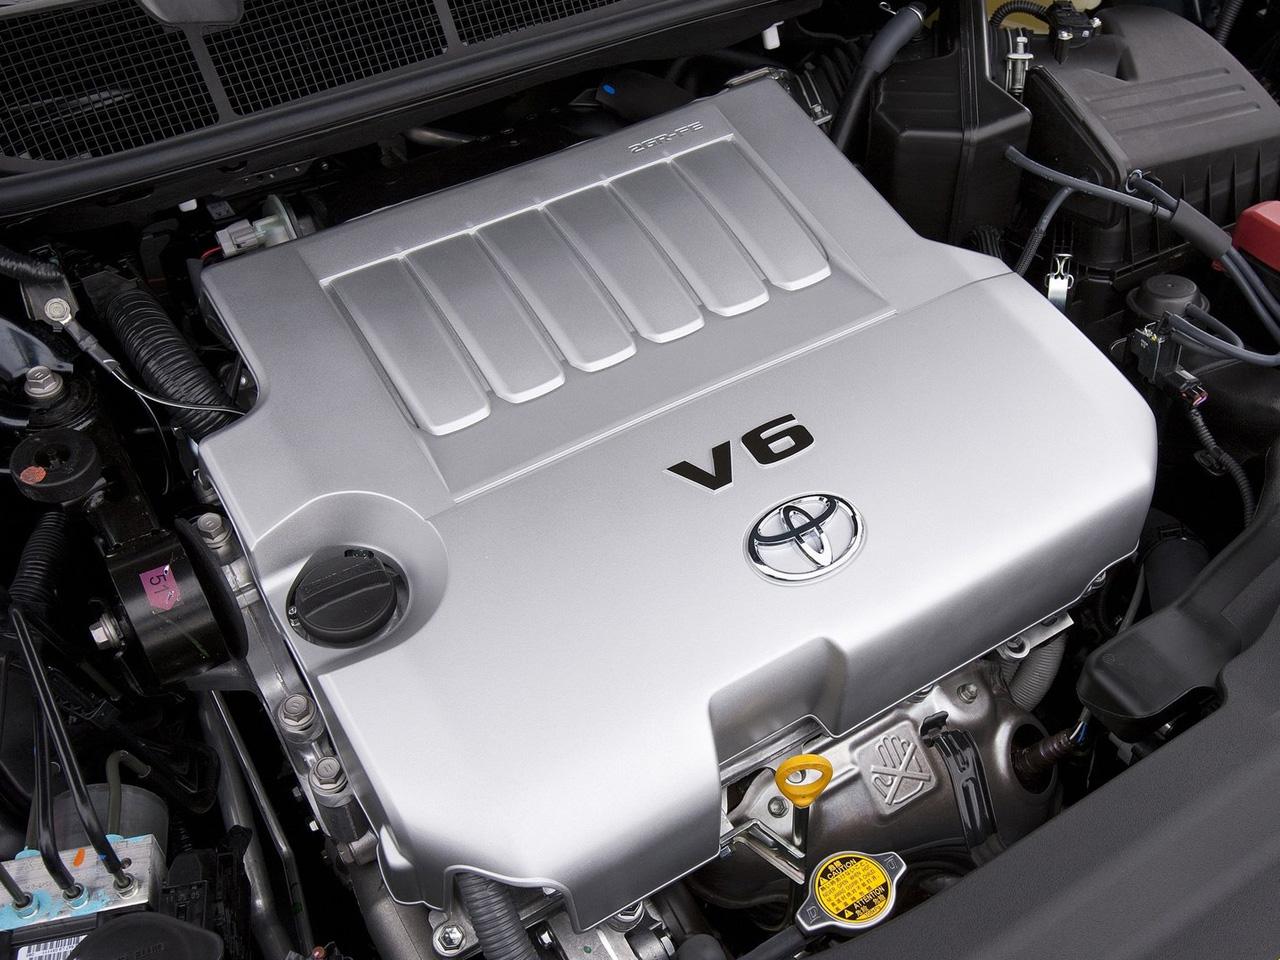 TOYOTA VENZA engine